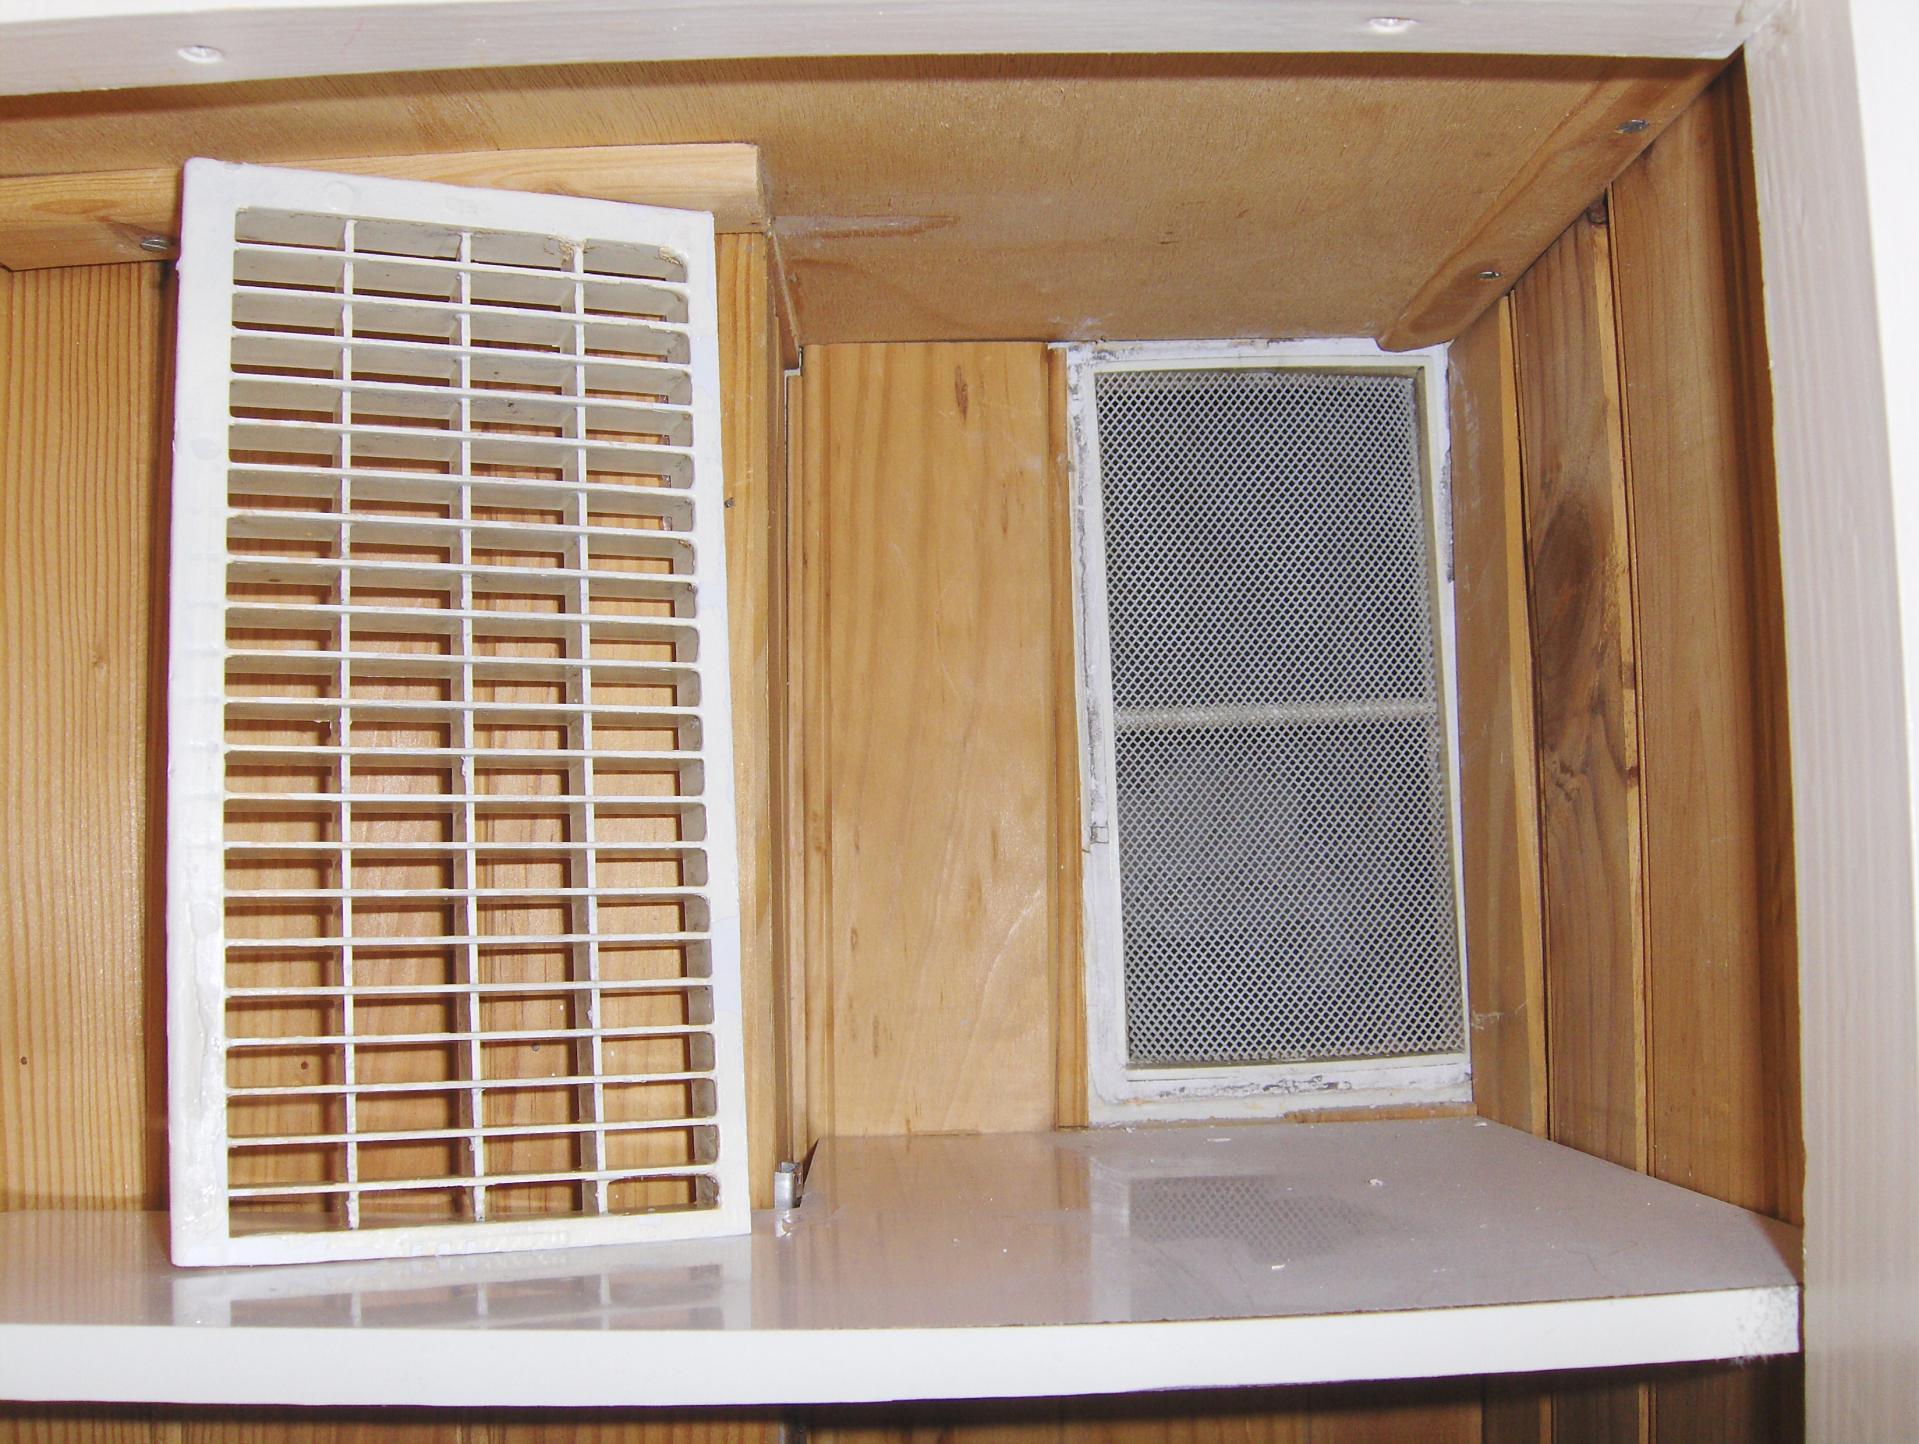 Grille aeration salle de bain 28 images vmc salle de for Salle de bain sans fenetre aeration